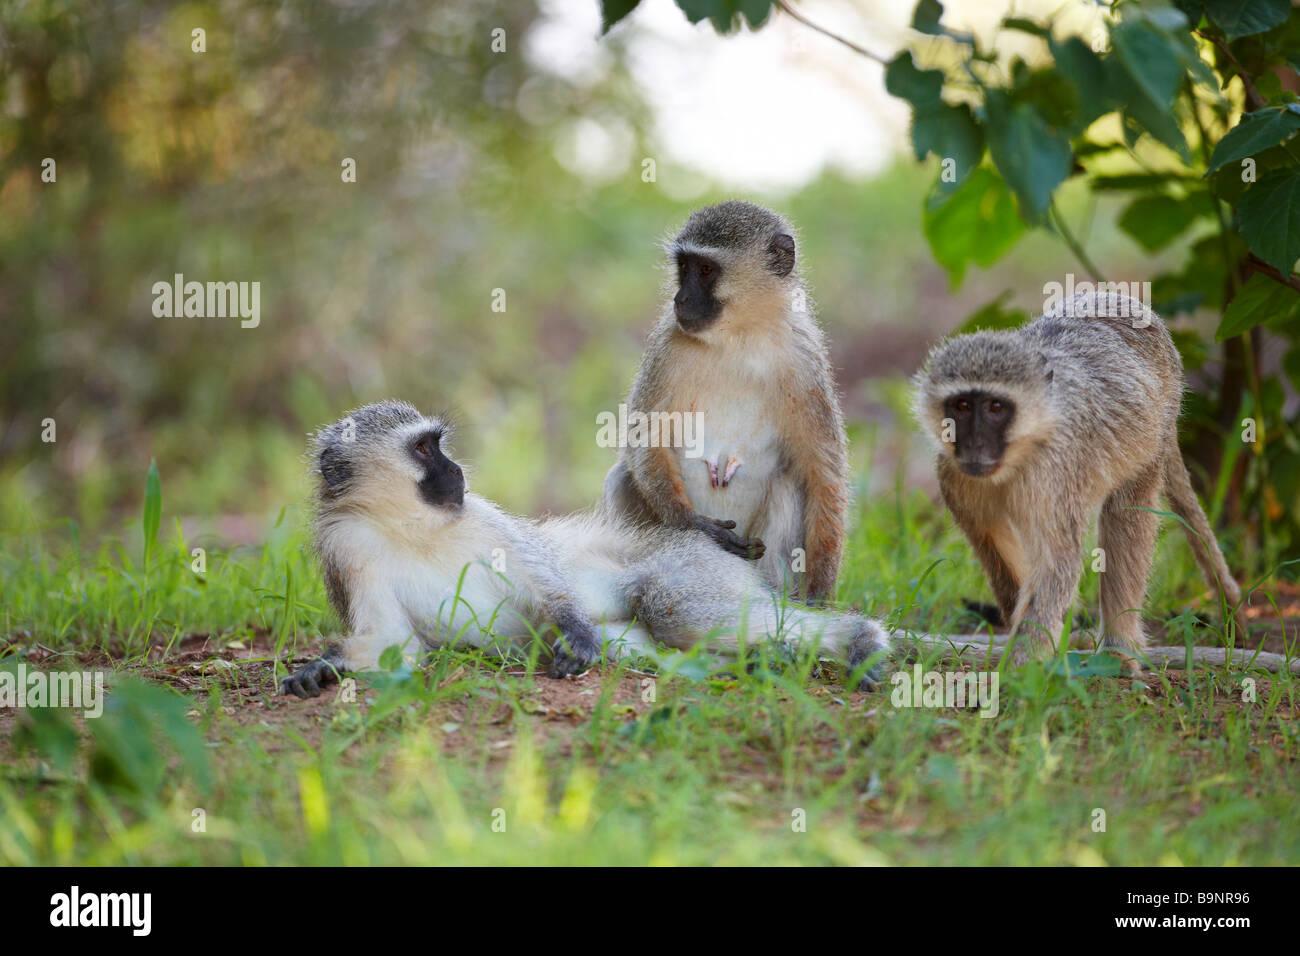 Famiglia di scimmie vervet nella boccola, Kruger National Park, Sud Africa Immagini Stock